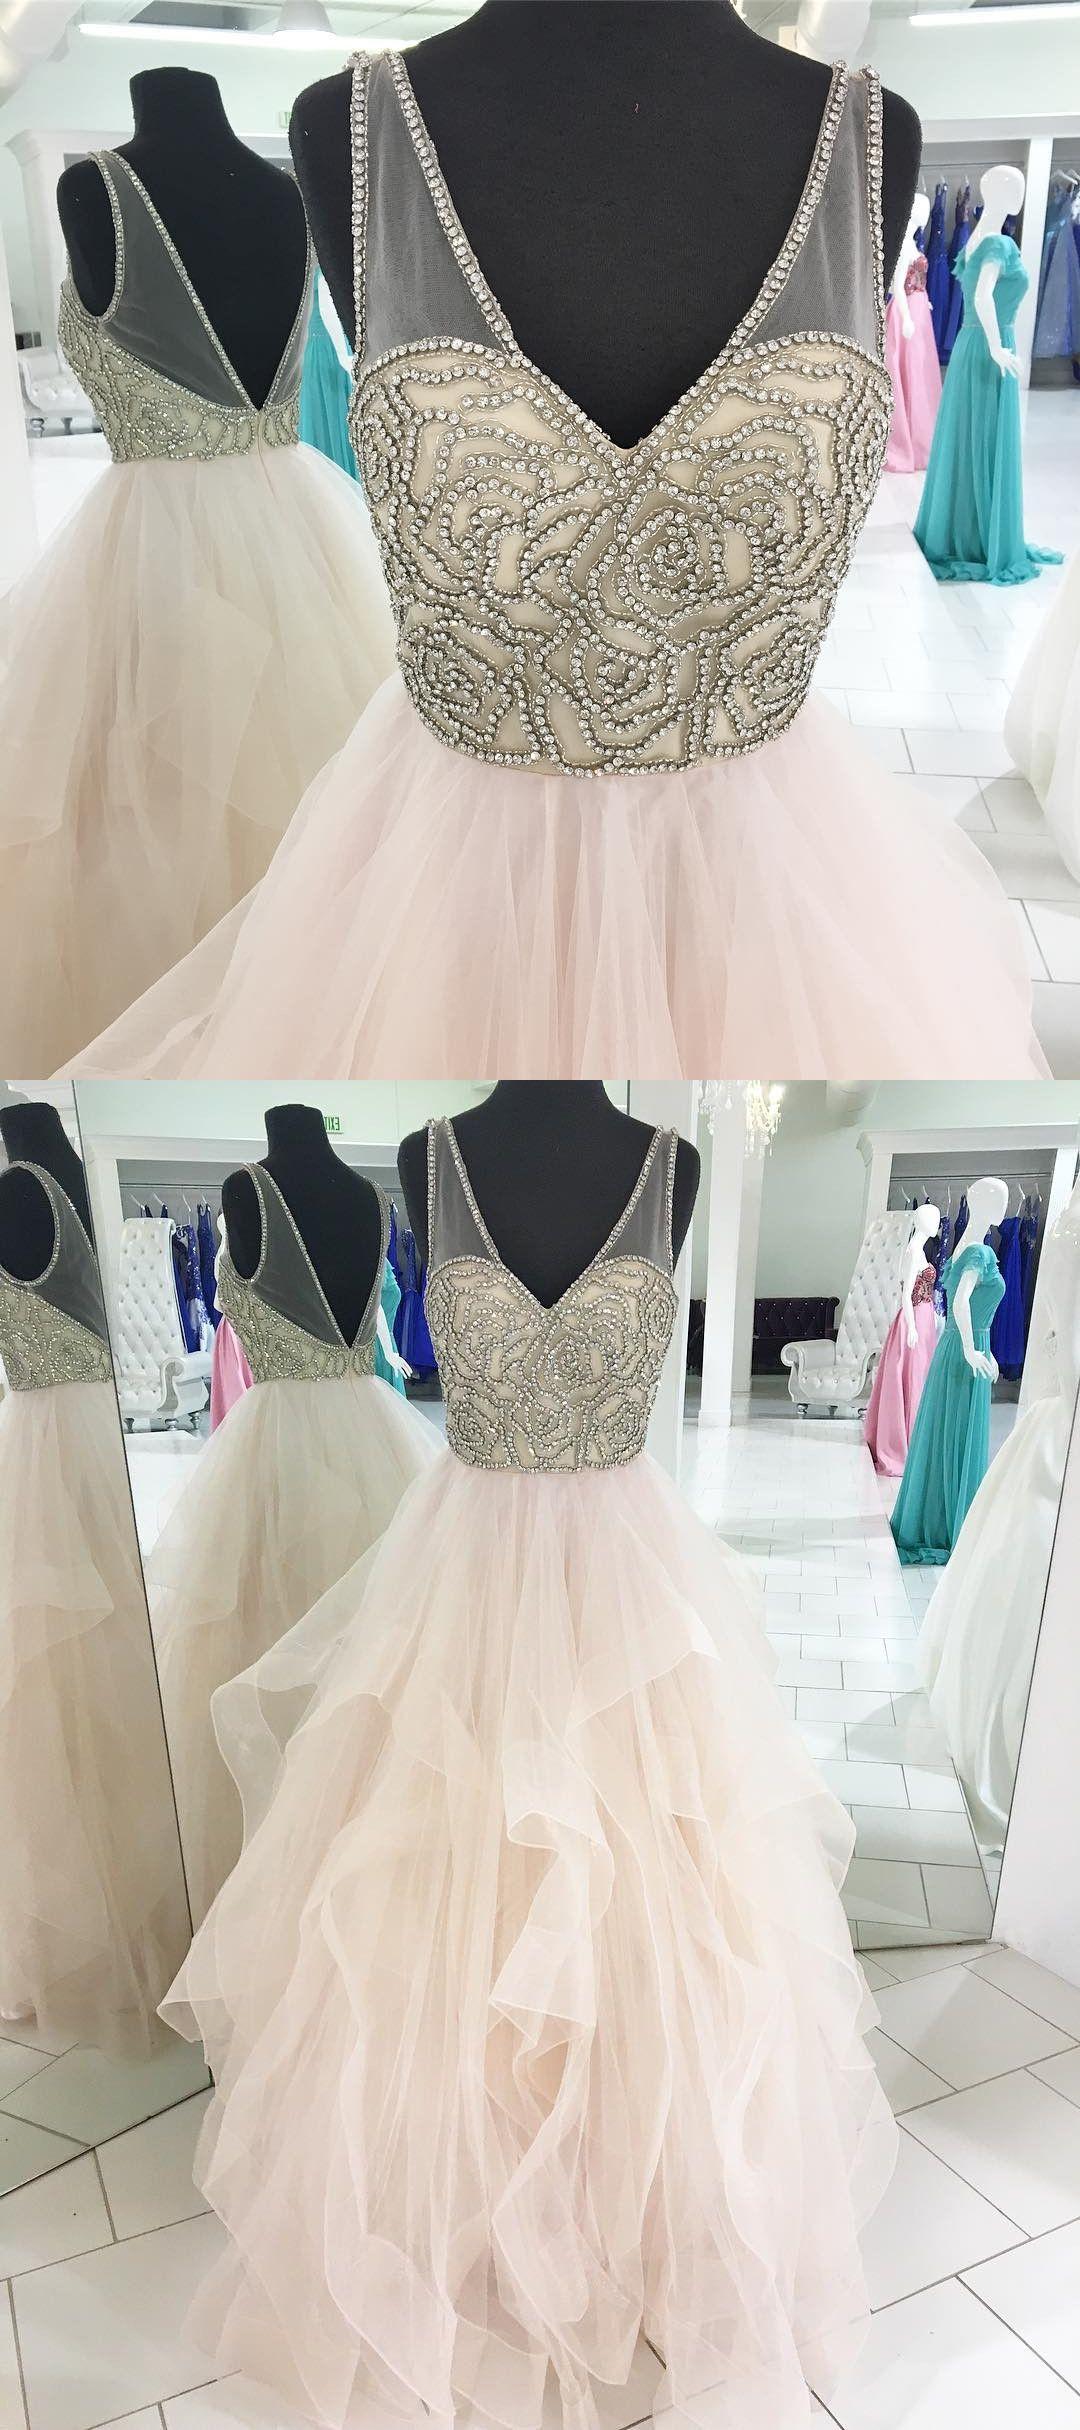 Princess prom dress pink long prom dress v neck beads long